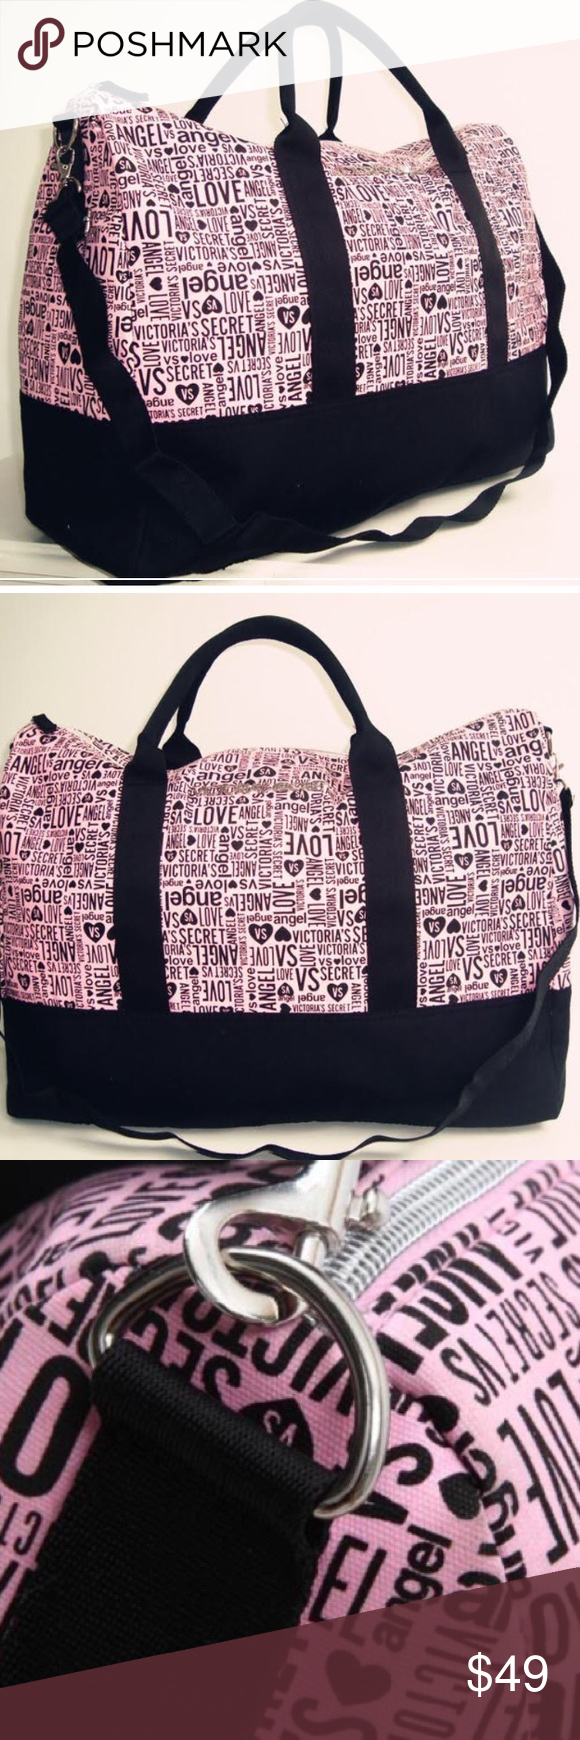 608f3a67aa80 Victorias Secret Pink Stripe Duffle Bag